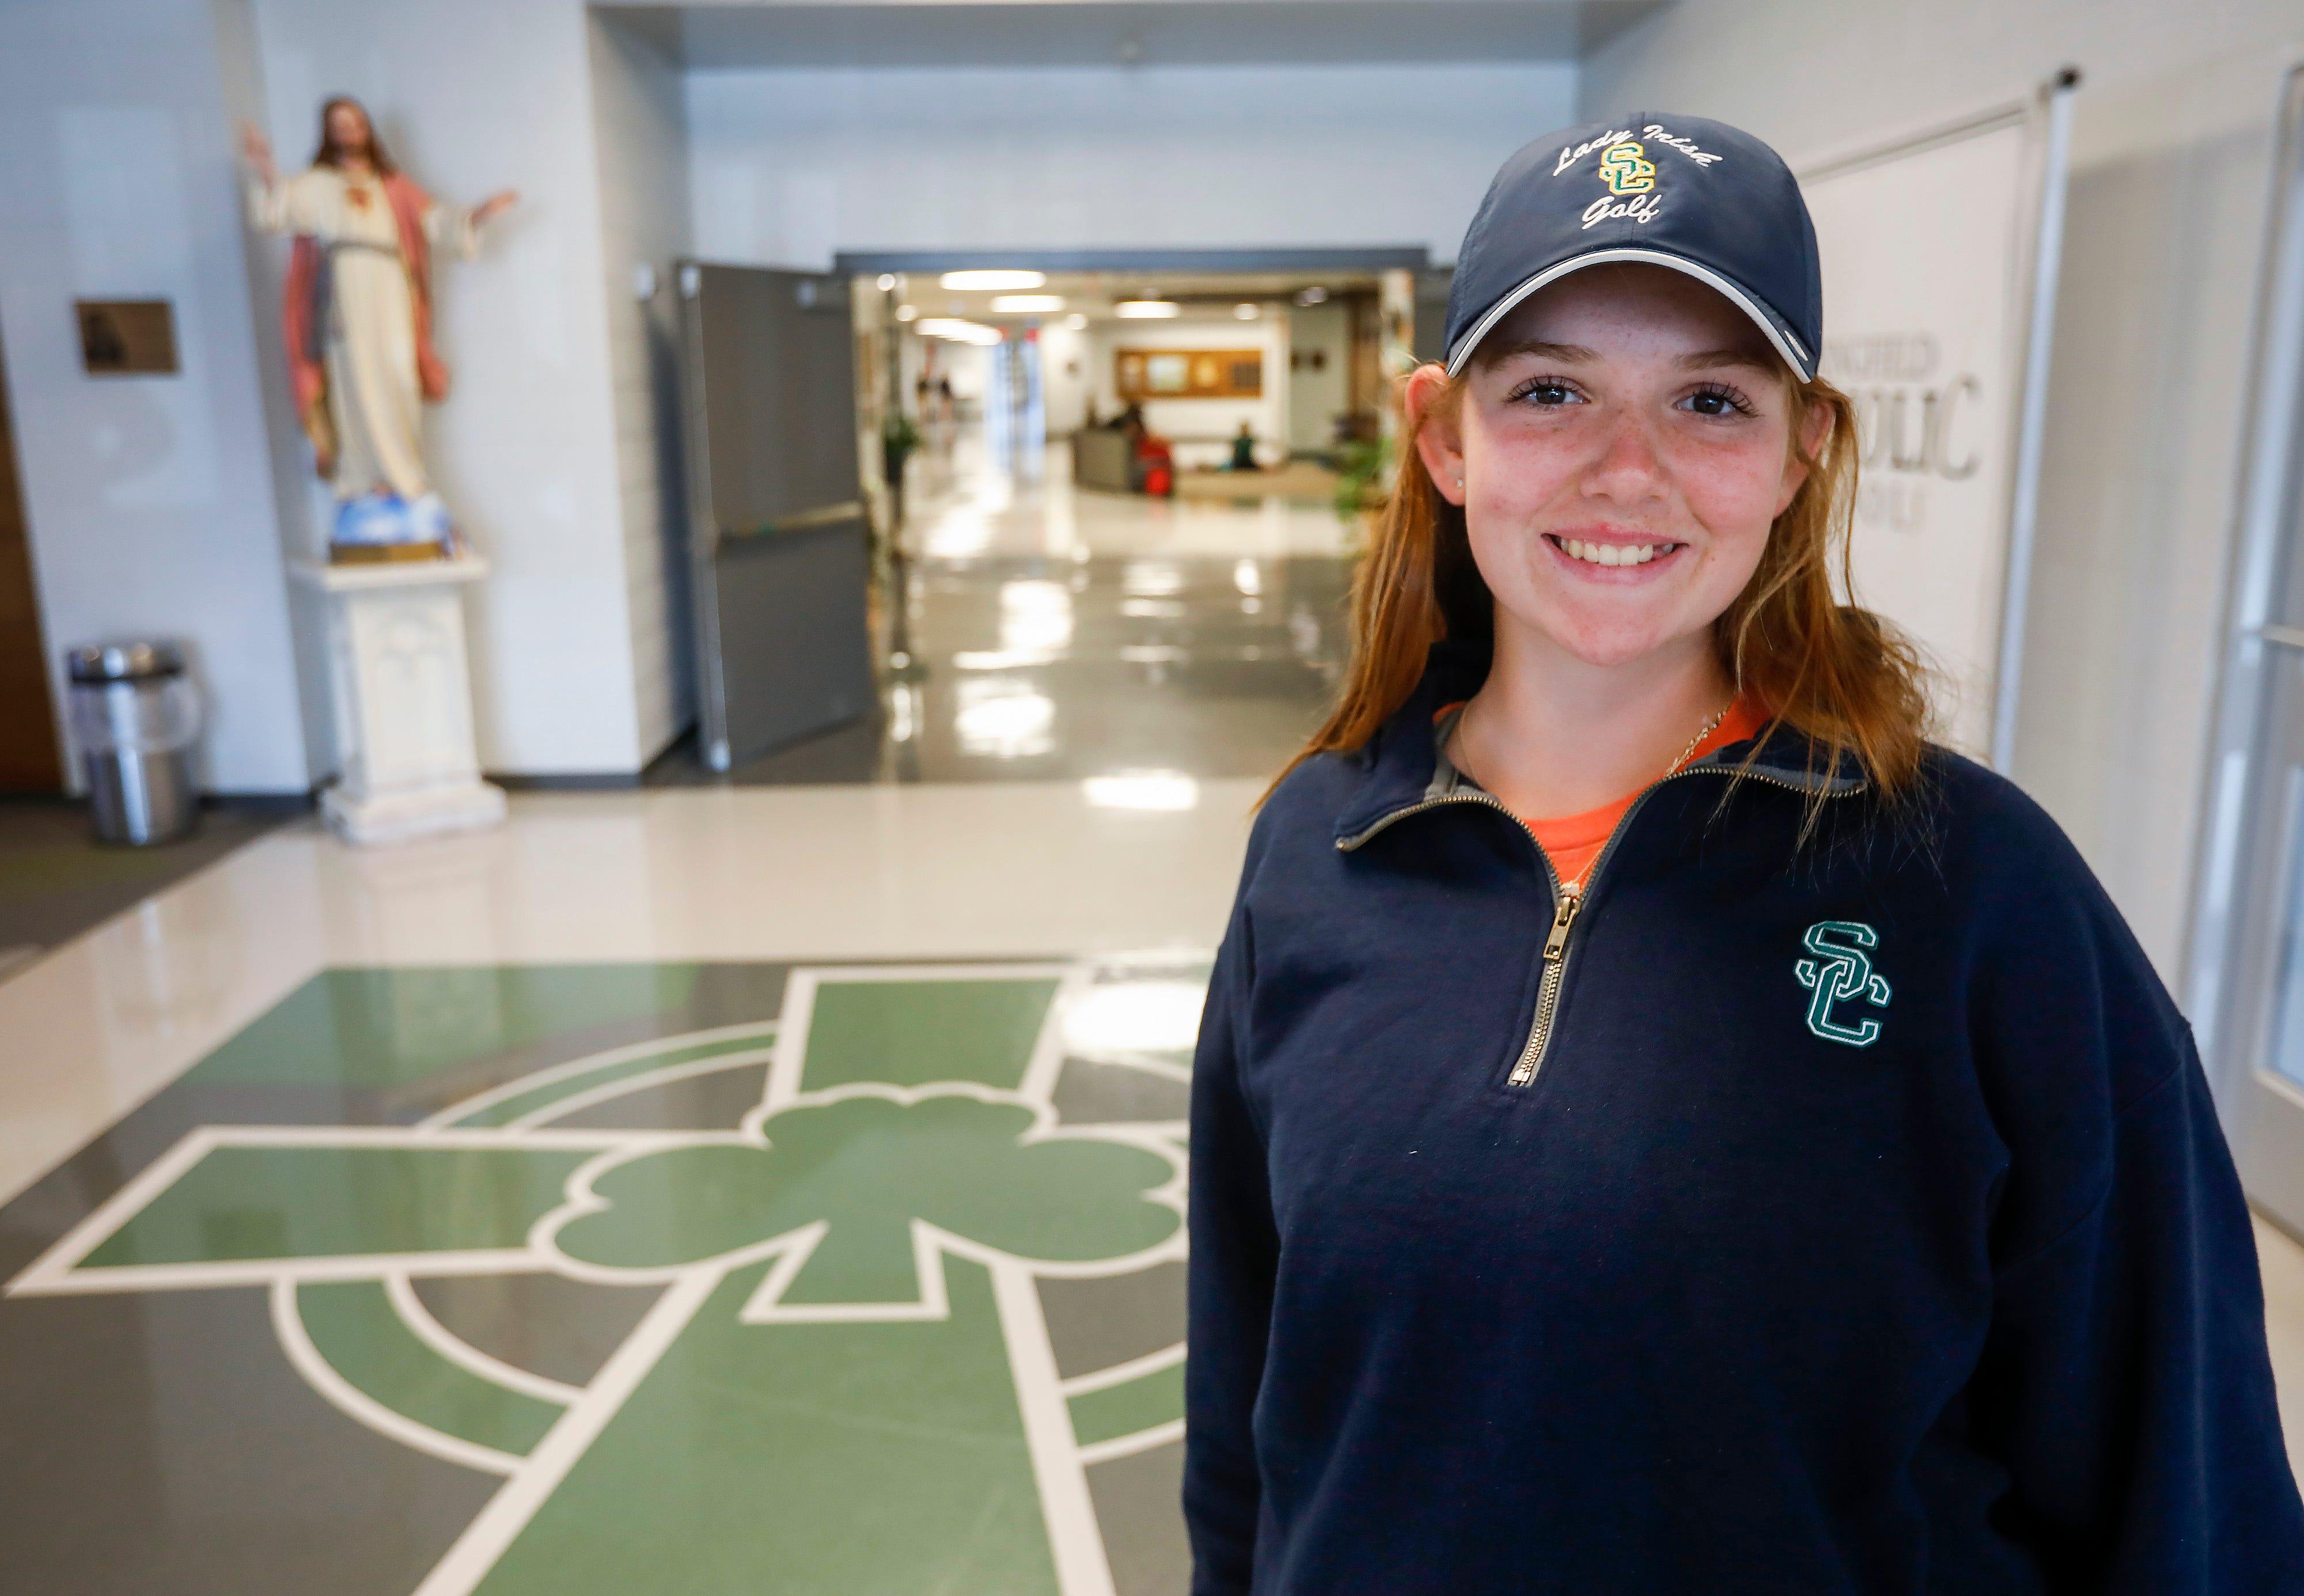 Reagan Zibilski, a freshman at Springfield Catholic High School, has a chance to participate in the U.S. Open.